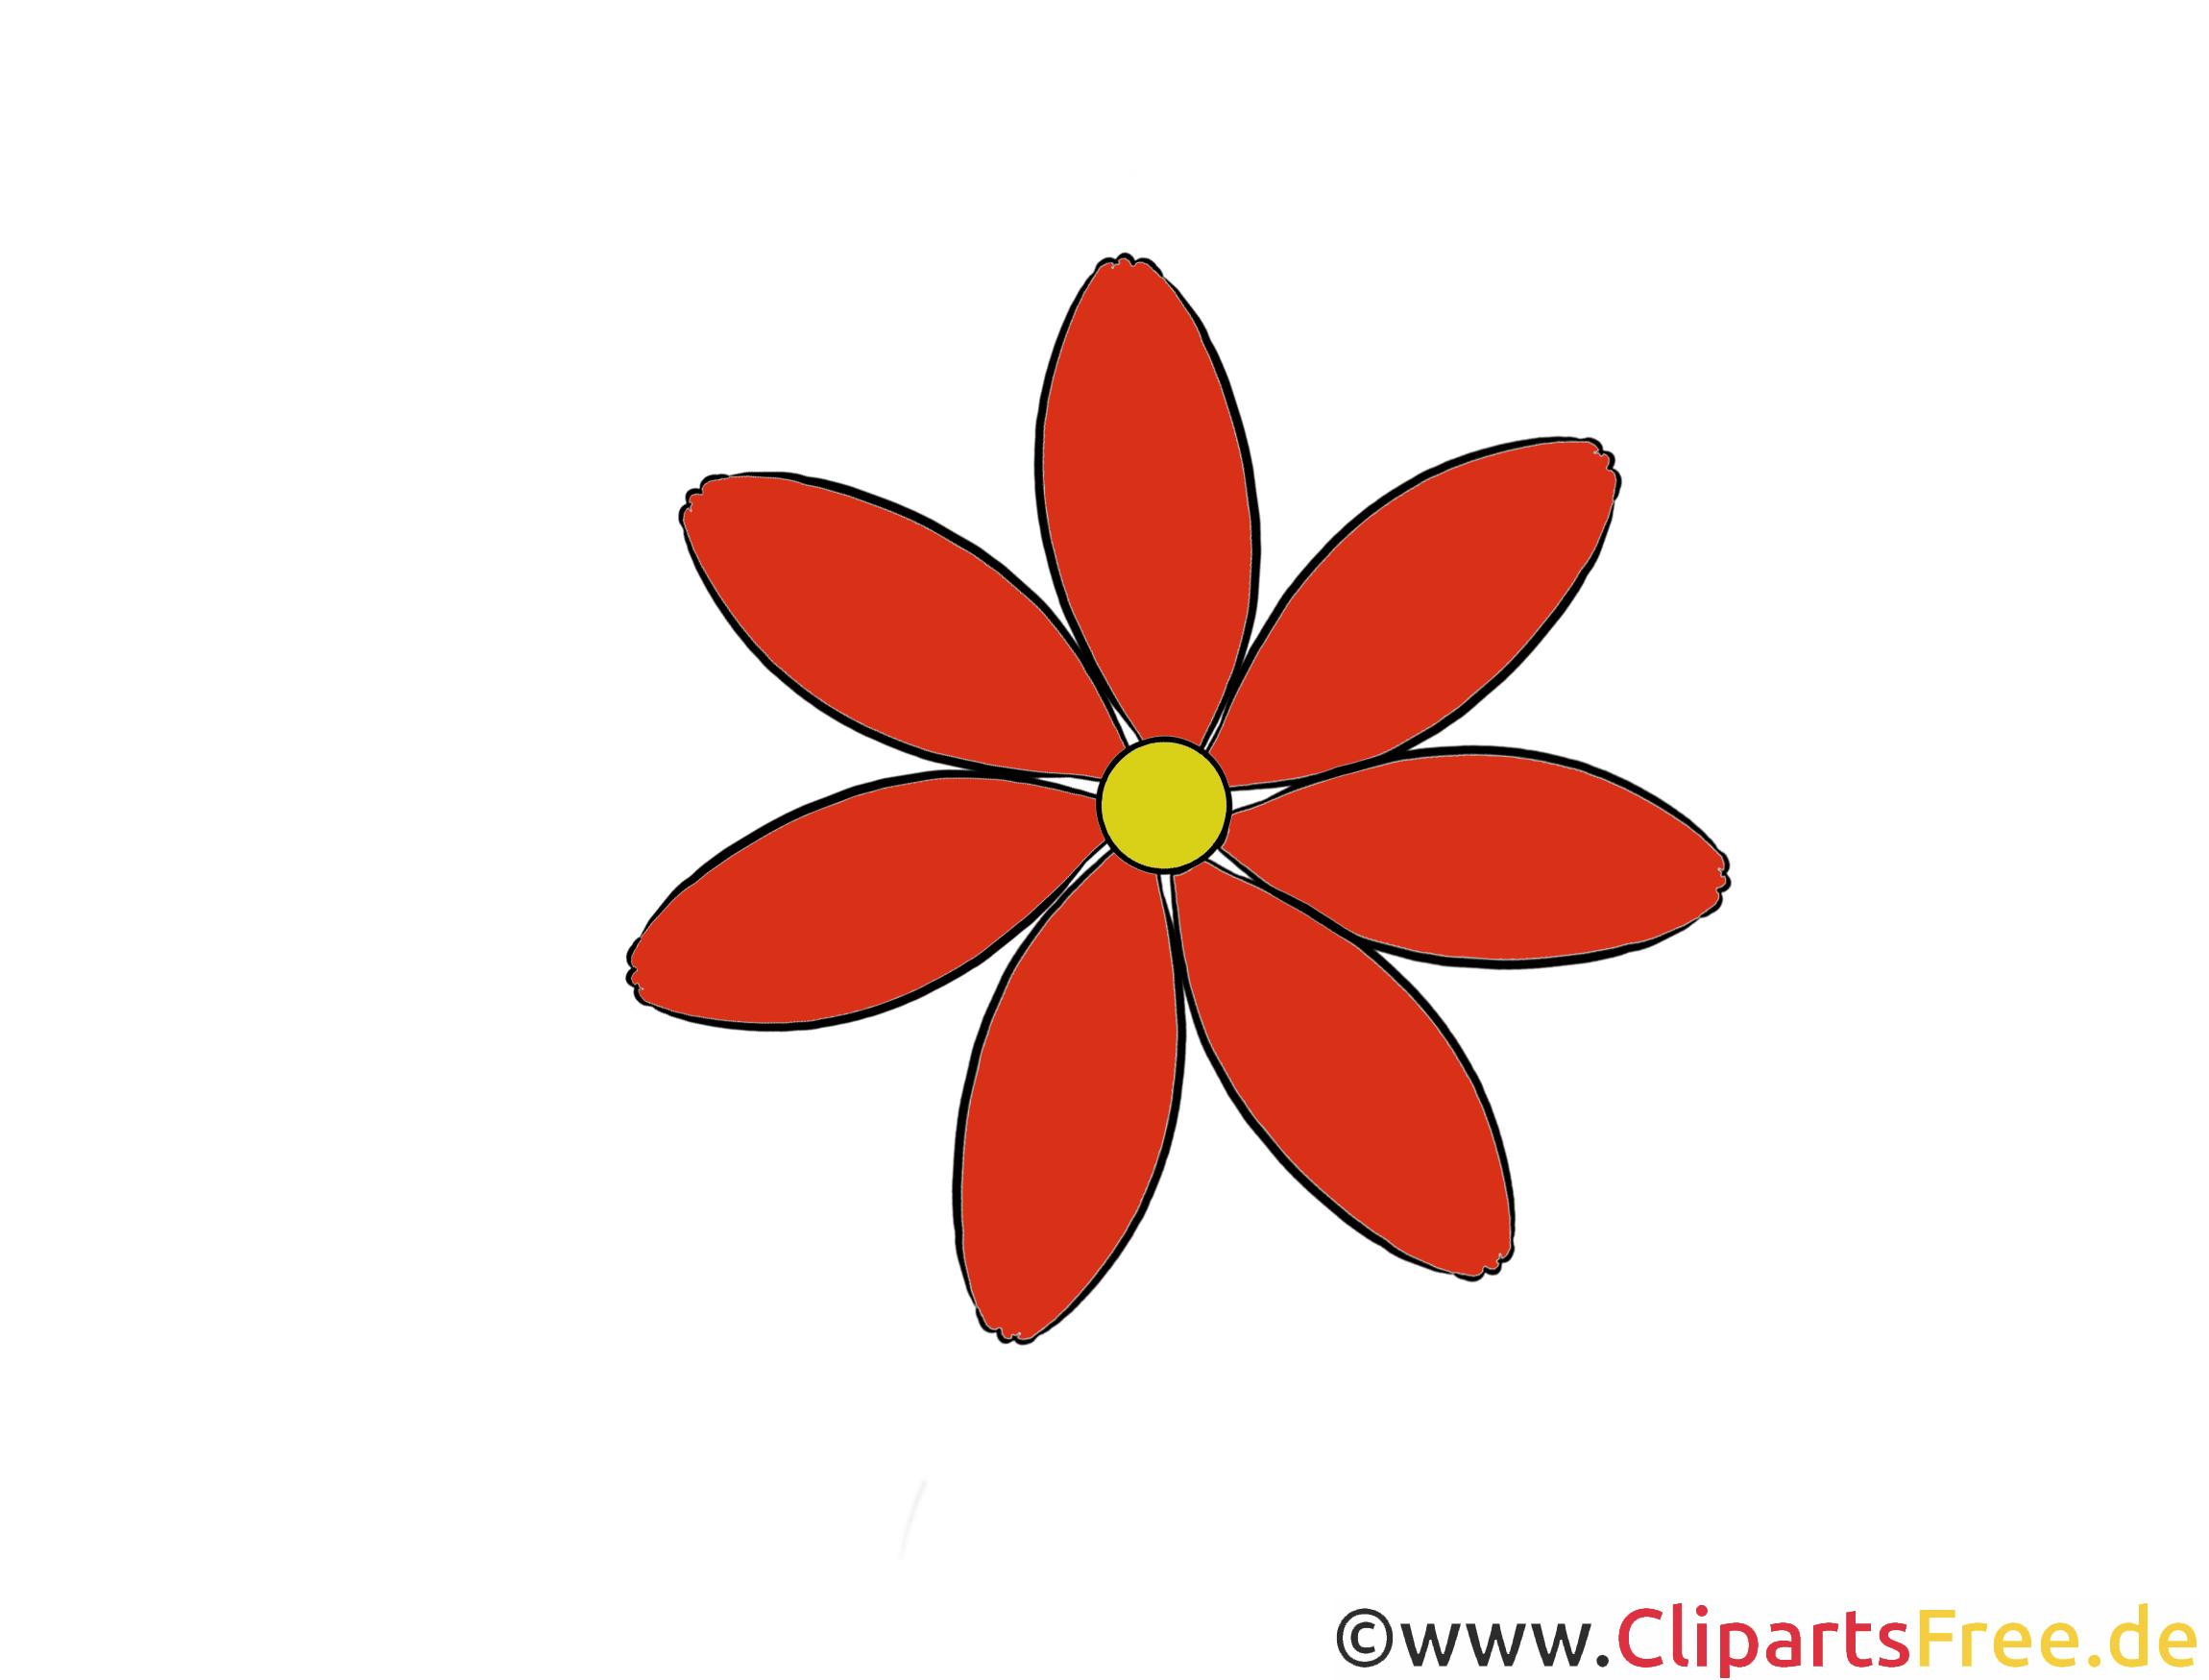 Rote Blume Clipart, Illustration, Bild kostenlos.